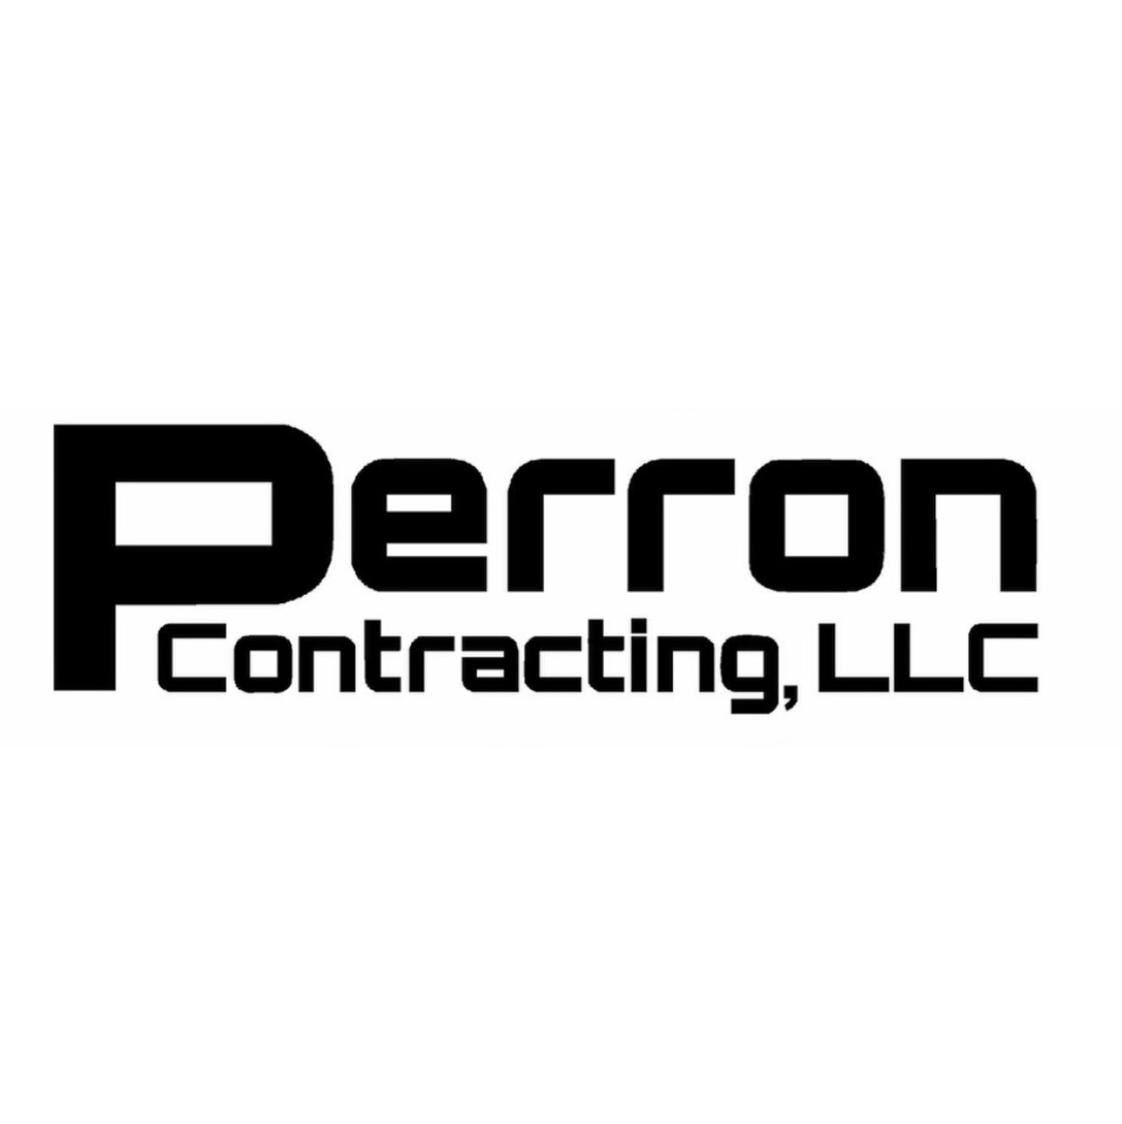 Perron Contracting, LLC logo